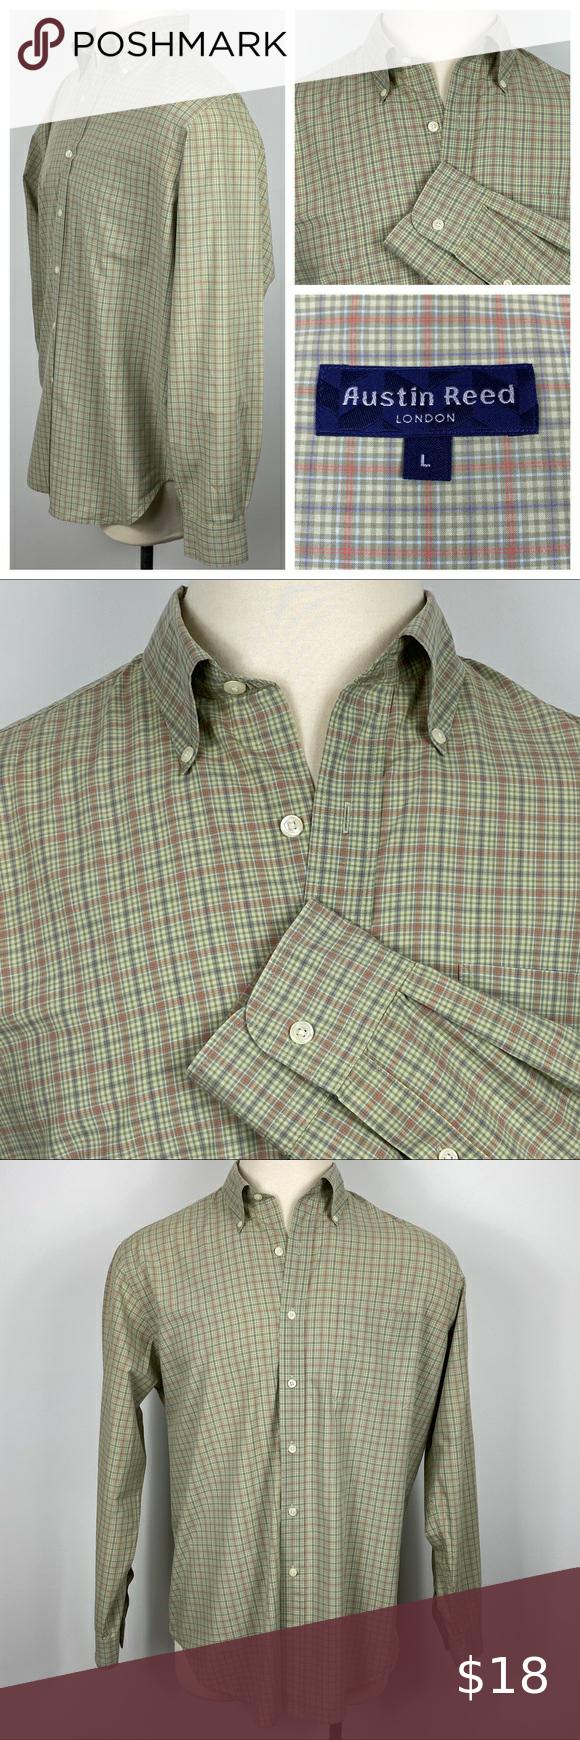 Euc Austin Reed London Dress Shirt Large London Dress Shirts Mens Shirt Dress Clothes Design